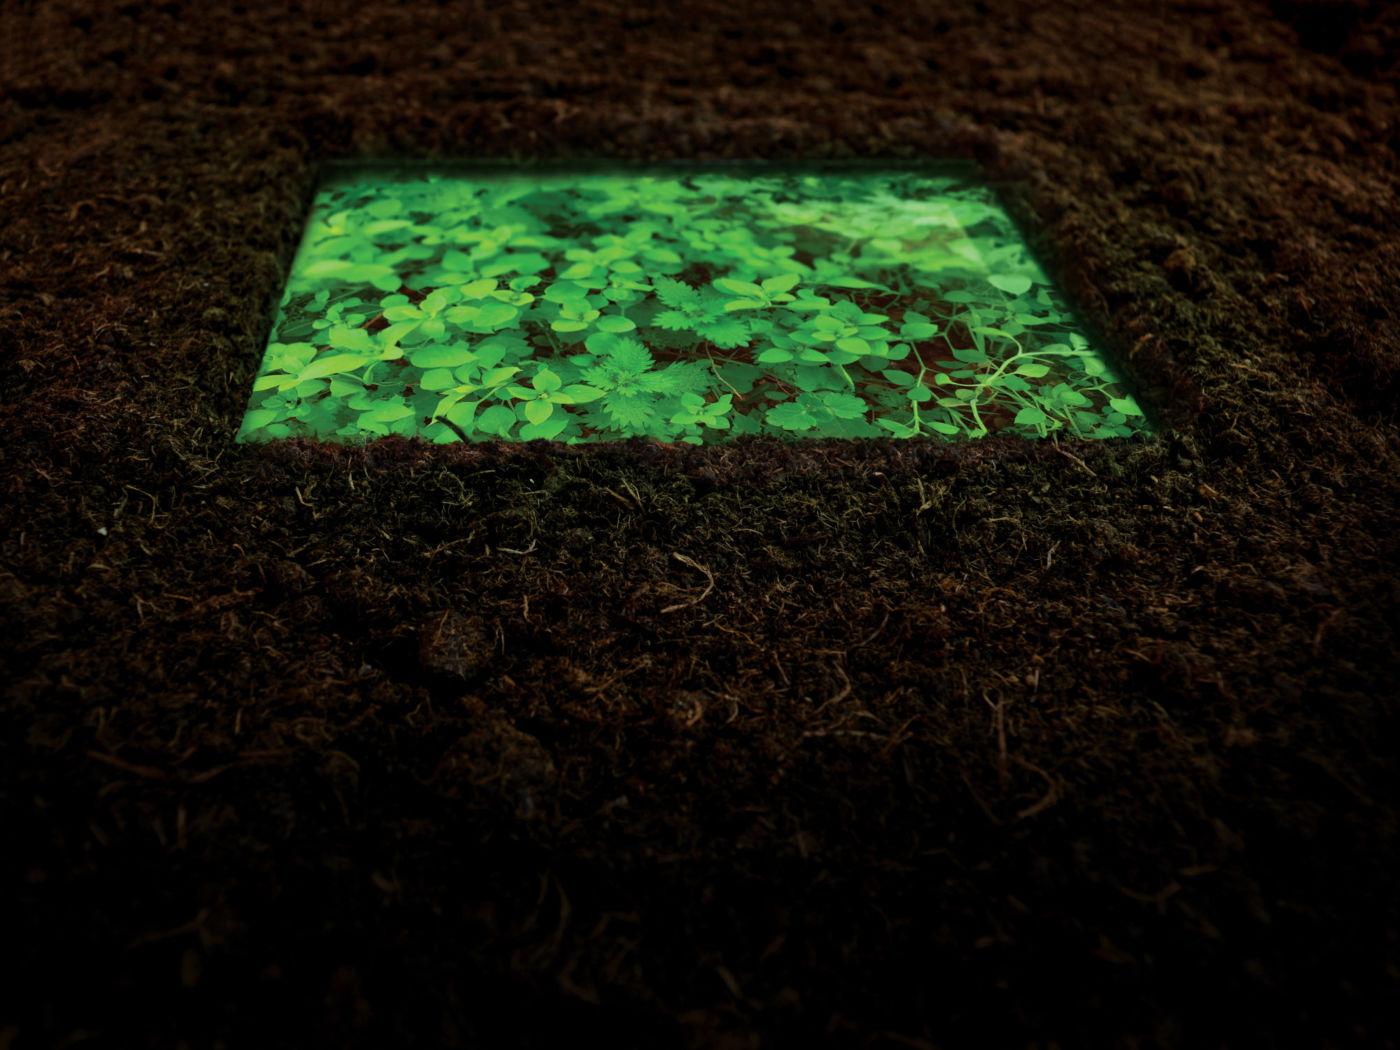 Ozan Atalan, Nelipot, 2019, video installation